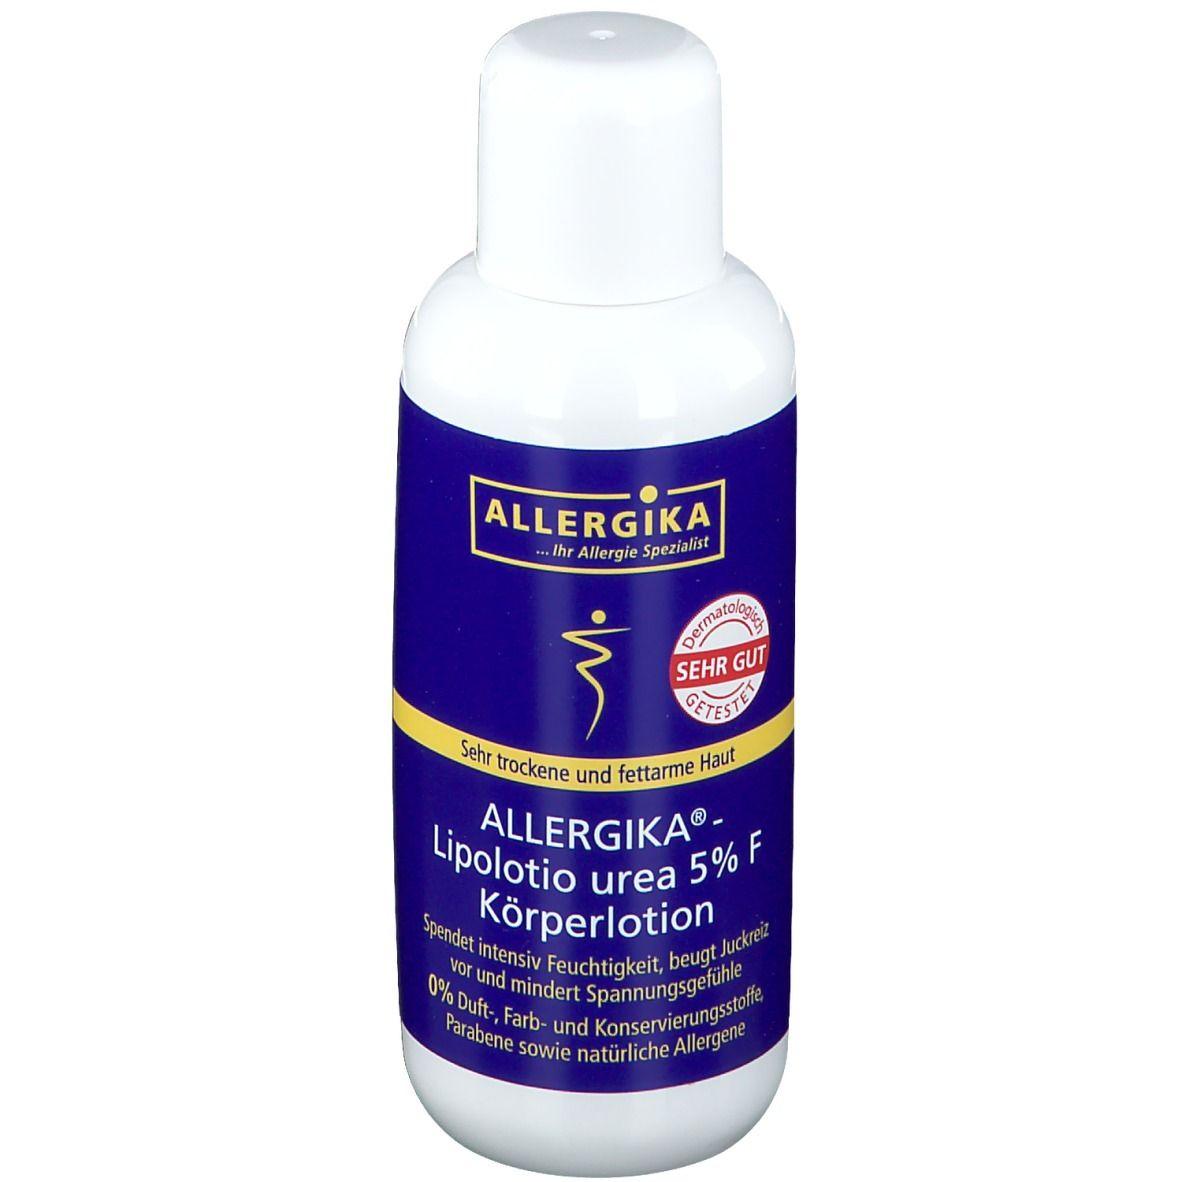 ALLERGIKA® Lipolotio urea 5% F Körperlotion